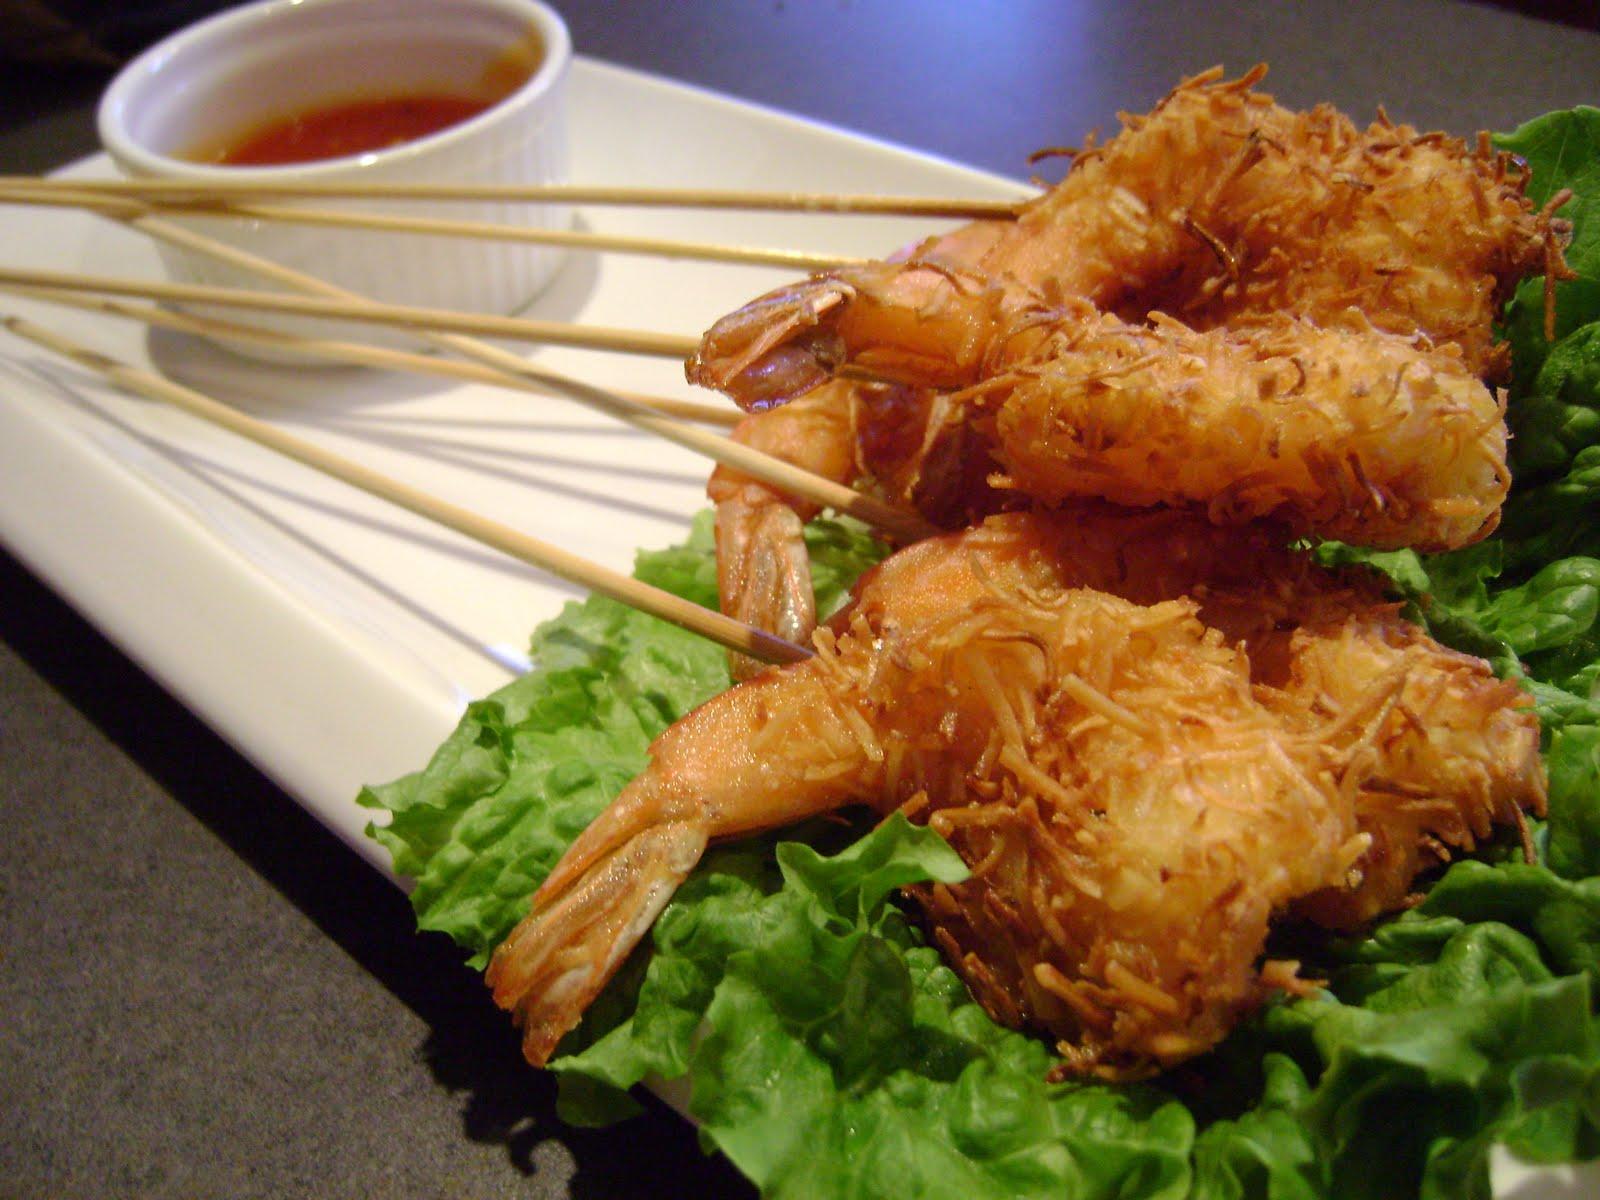 coconut shrimp coconut shrimp tend to be skinny coconut shrimp coconut ...